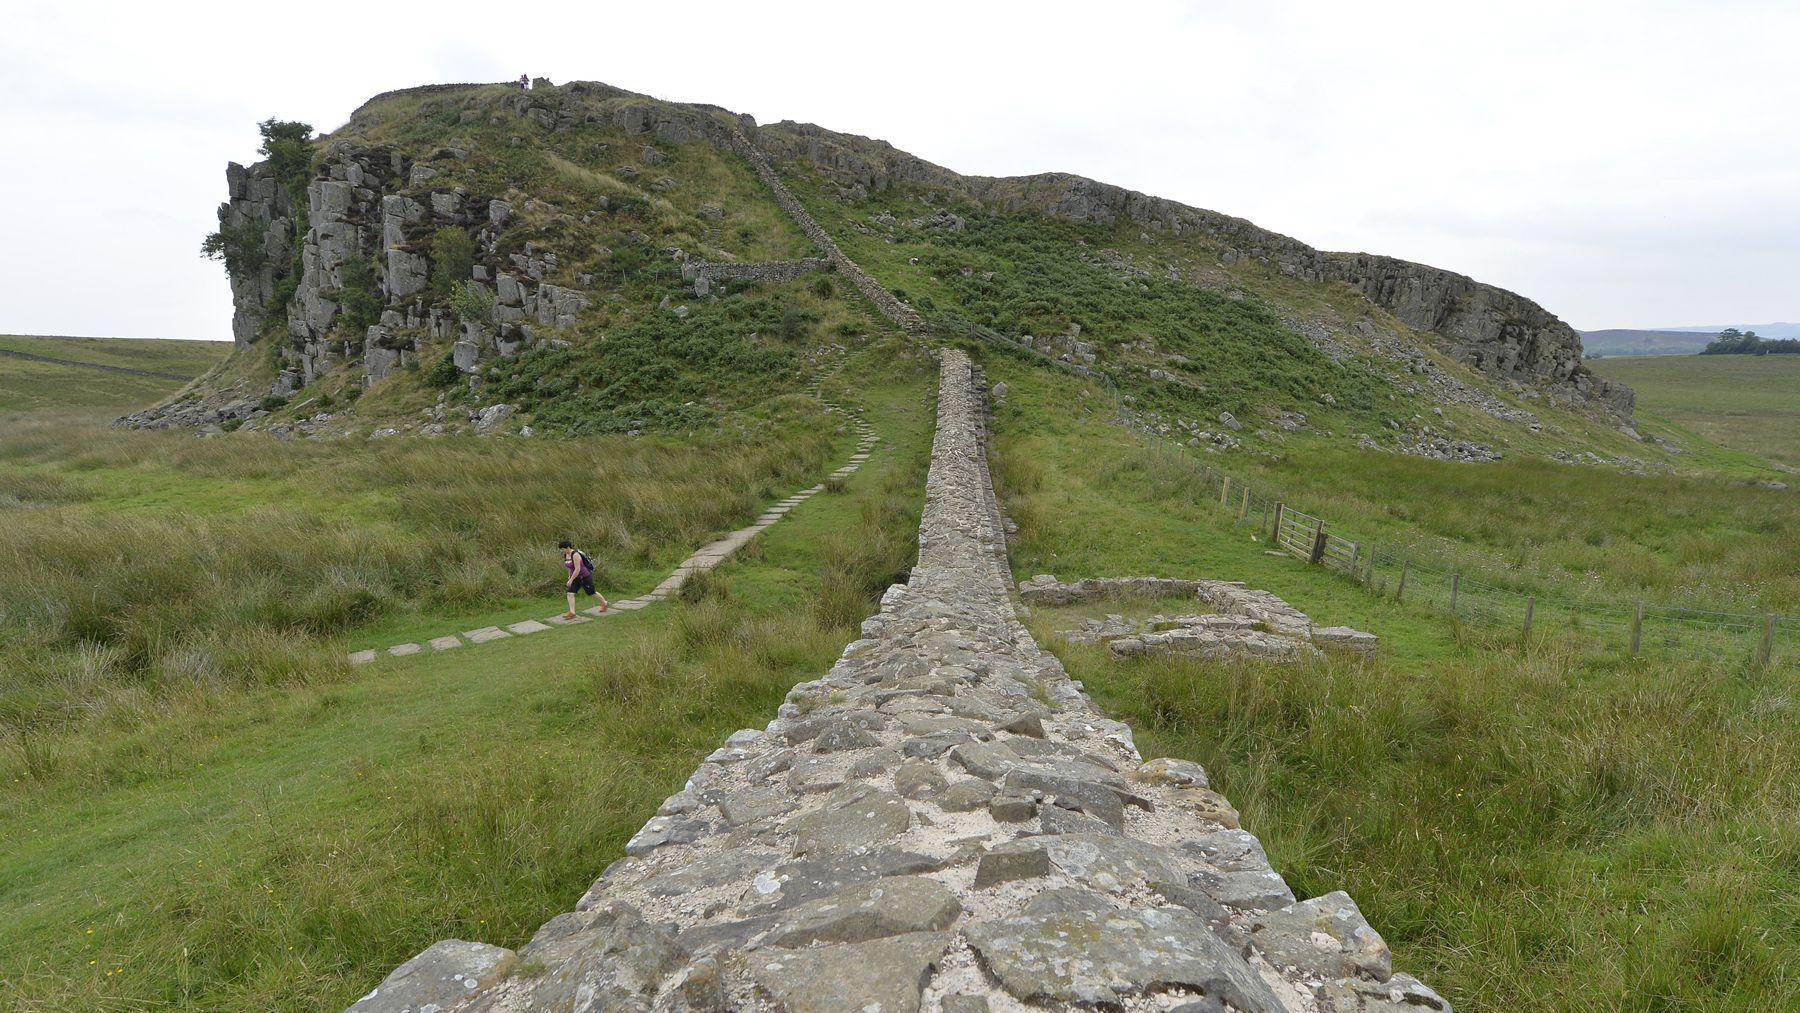 A rambler walks away from Peel Crag along Hadrian's Wall near Hexham in Northumberland August 23, 2013.